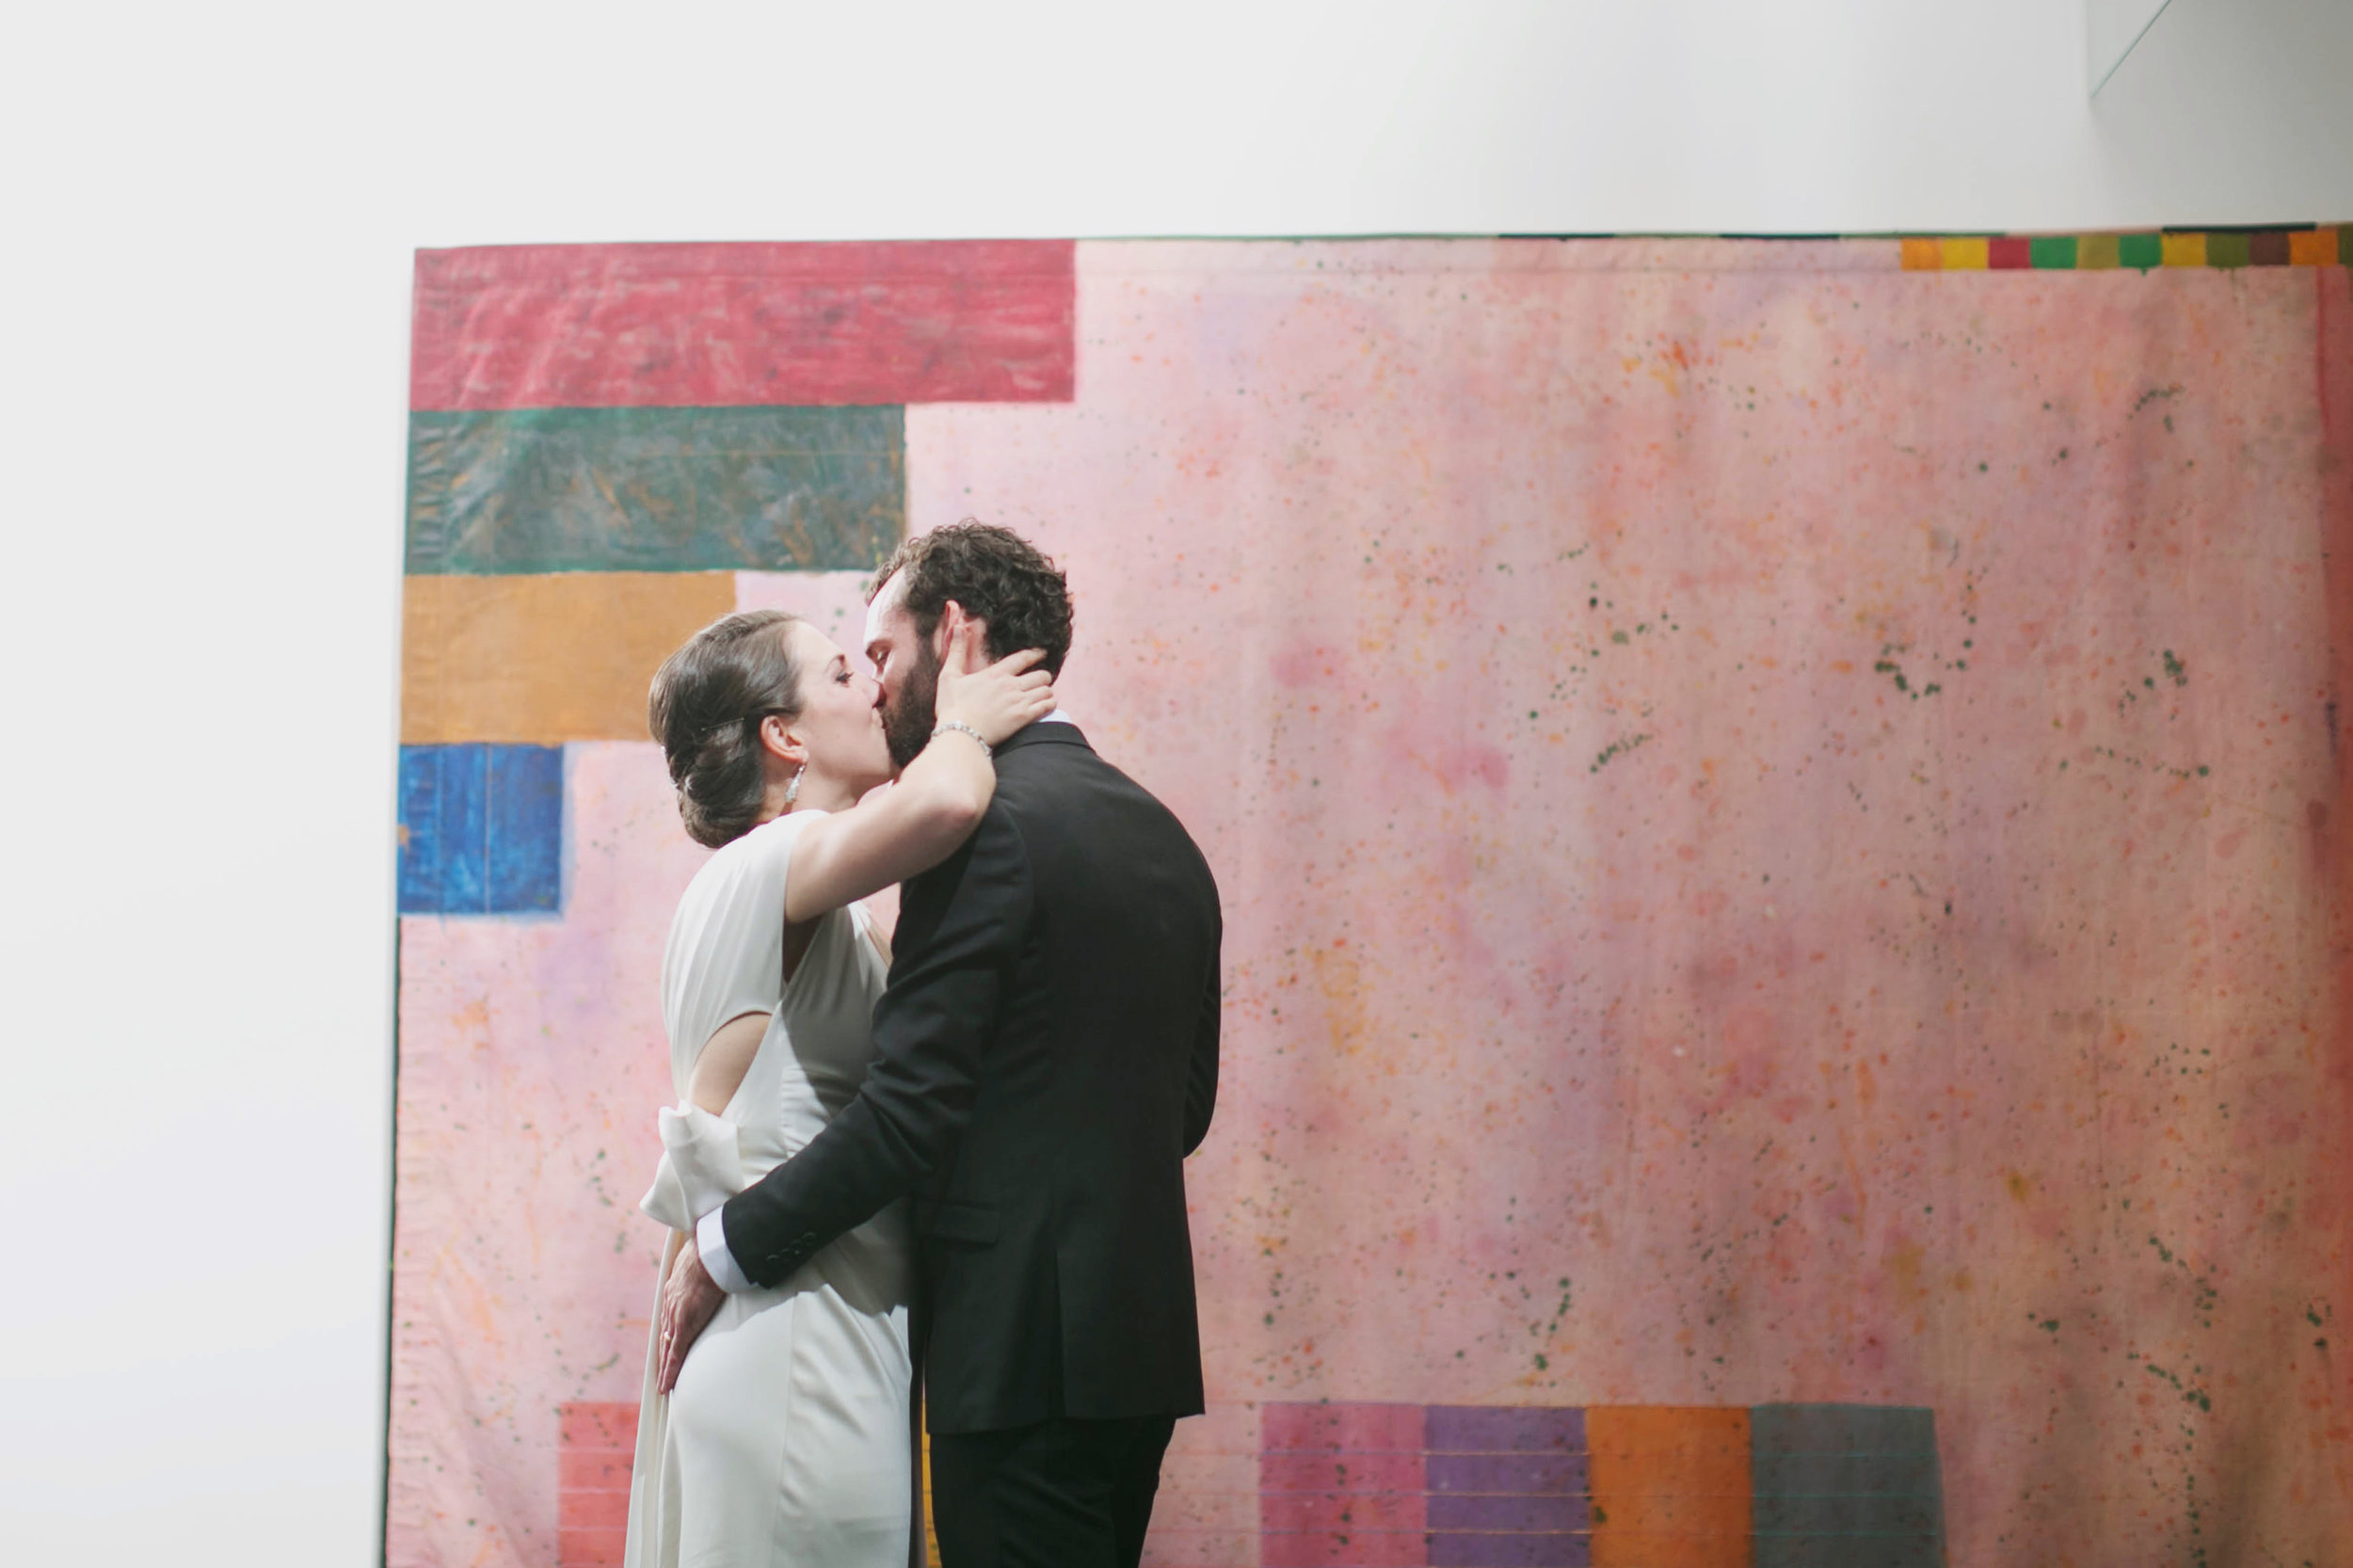 Photo:  Heidi Geldhauser of Our Labor of Love